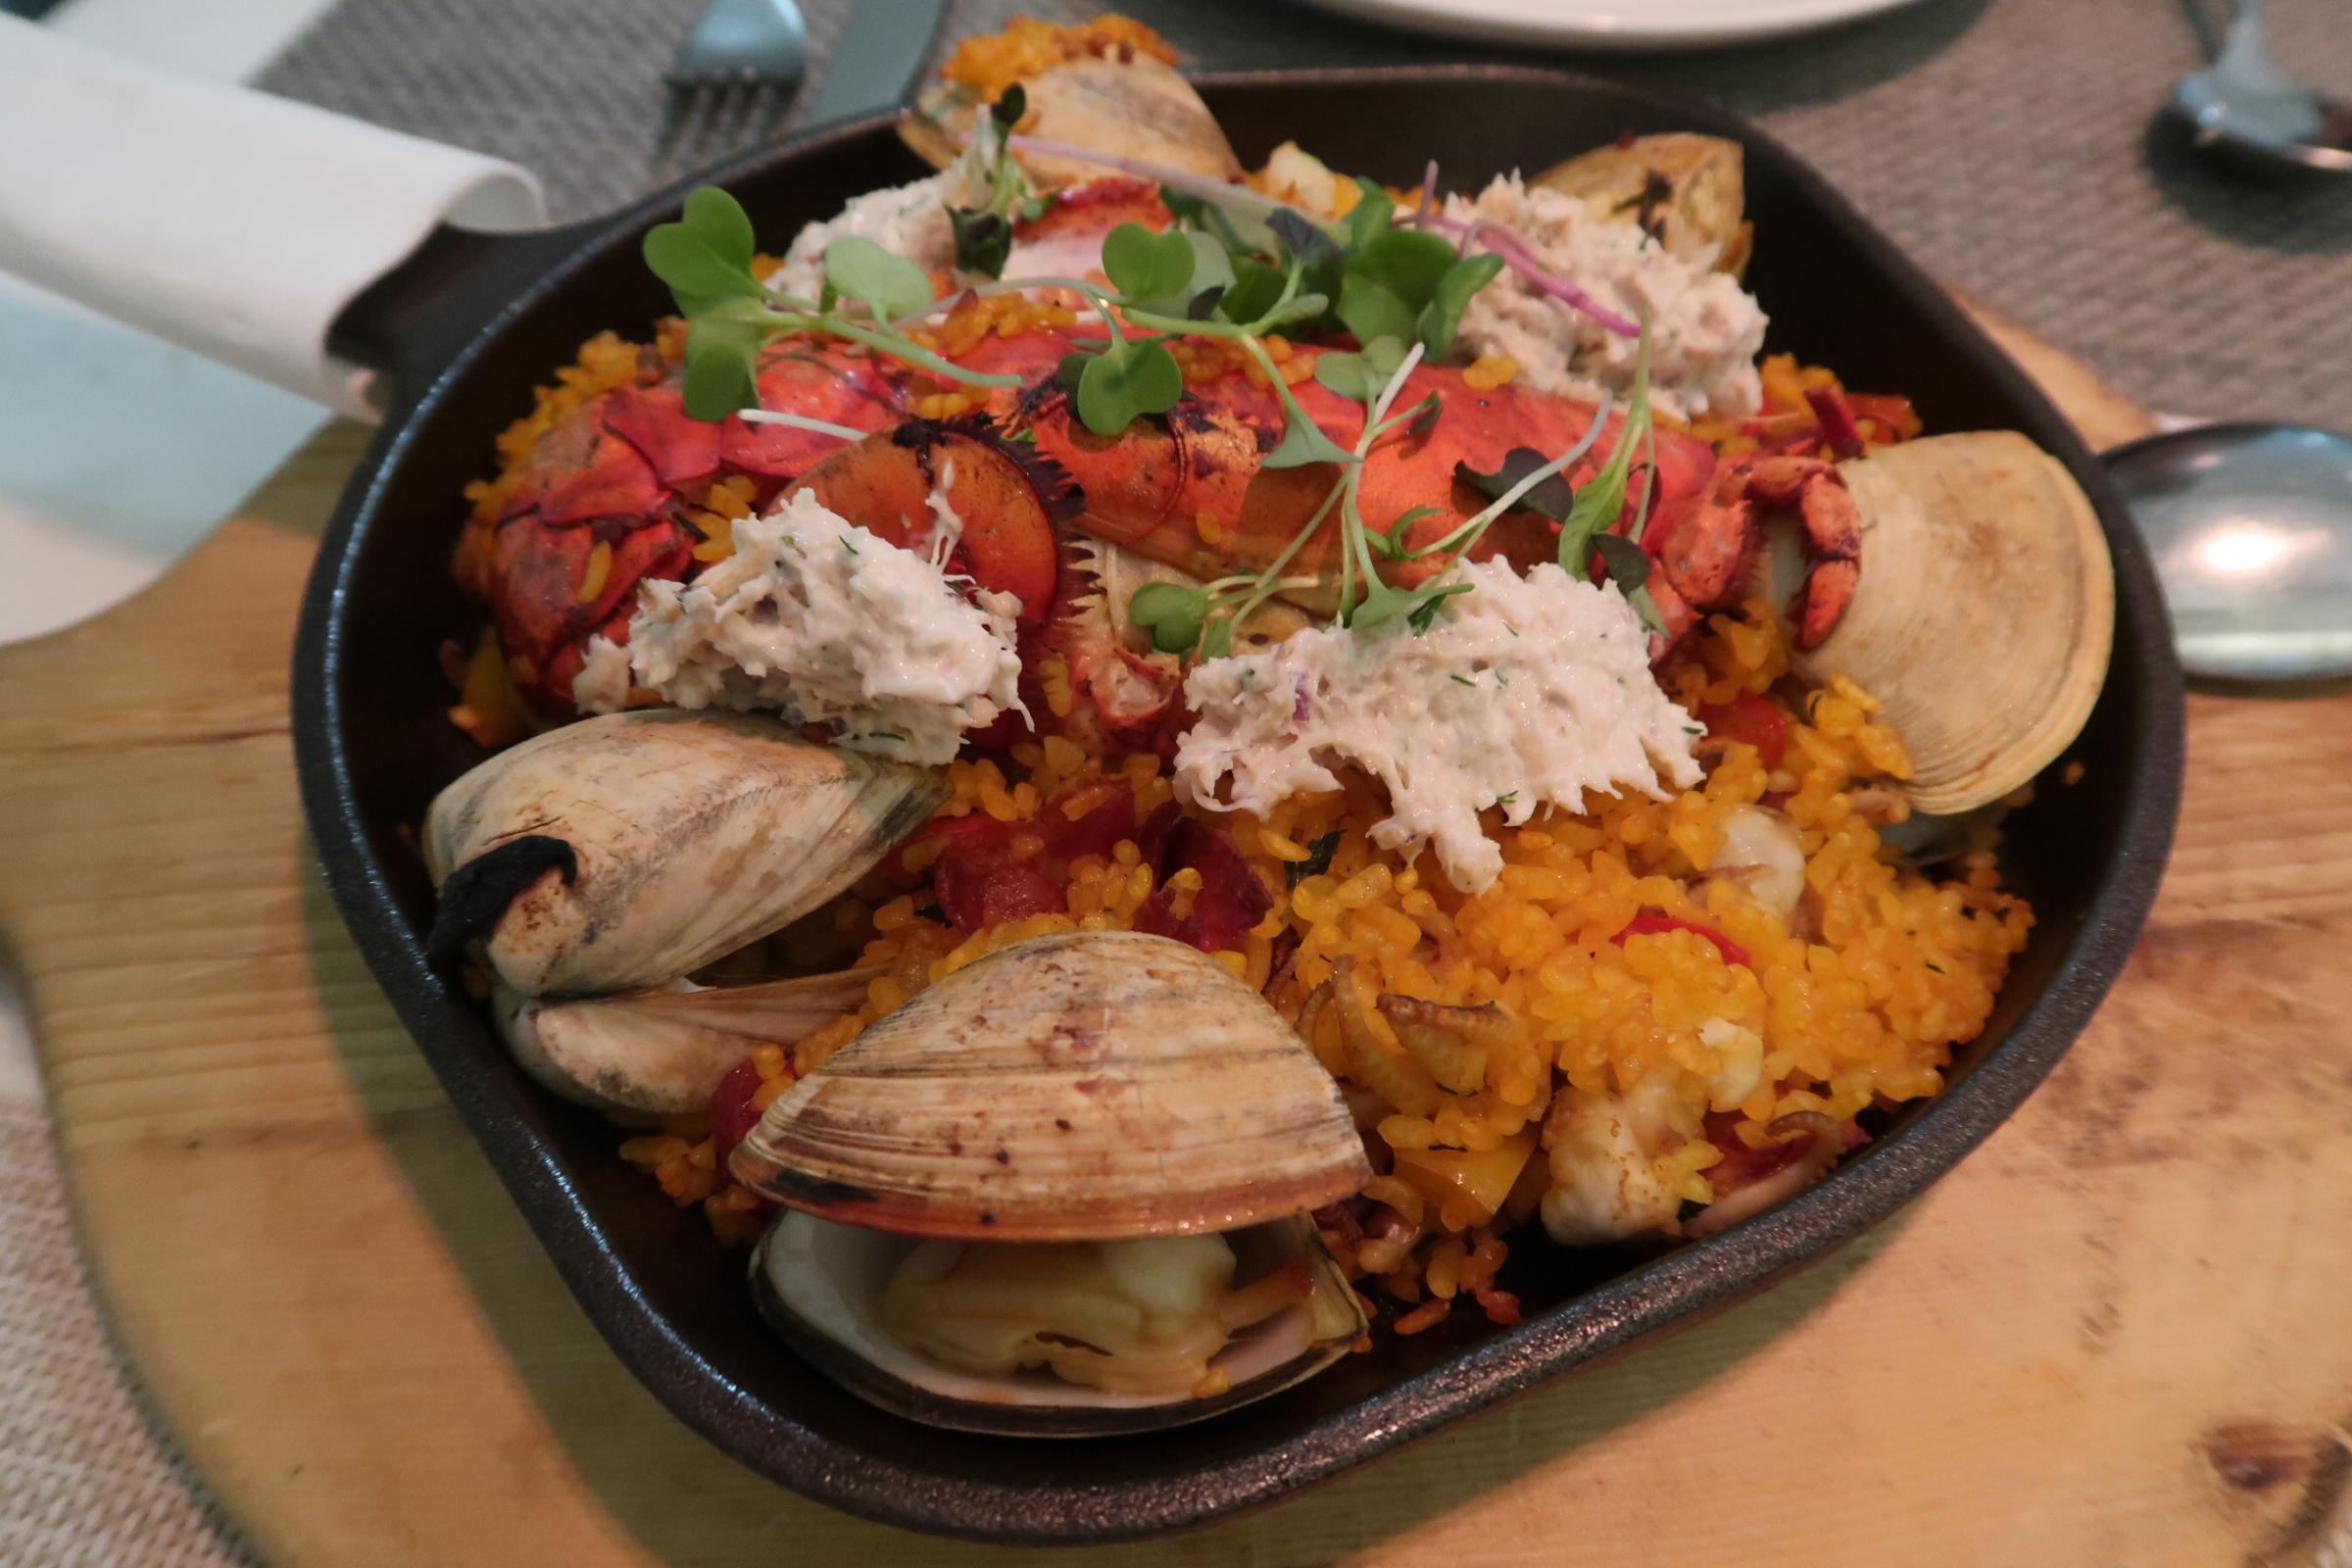 佐敦高質西餐丨Chelsea Garden & Restaurant